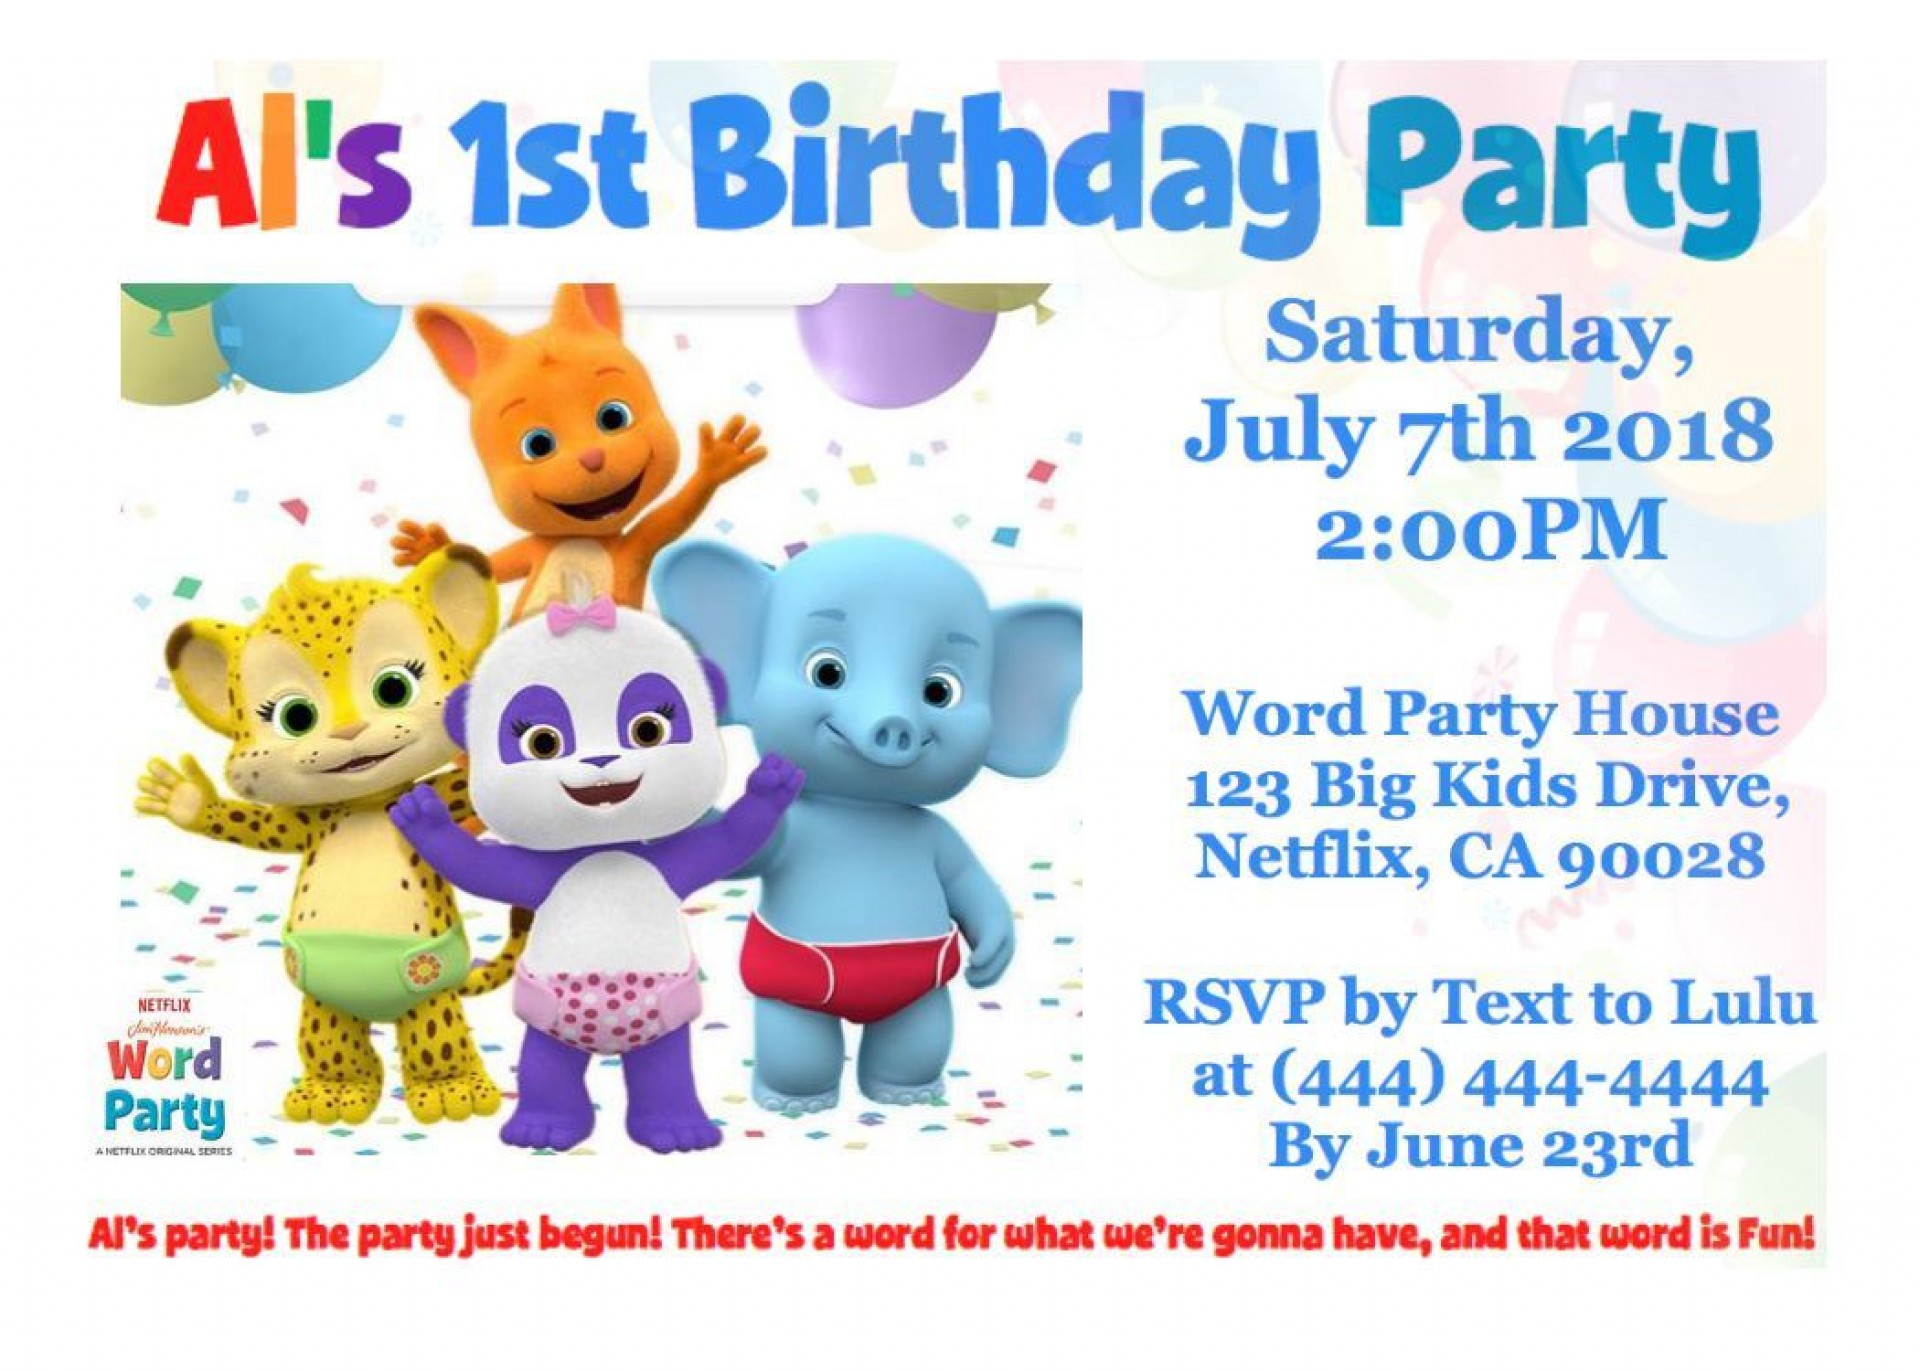 001 Impressive Microsoft Word Birthday Invitation Template High Resolution  Editable 50th 60th1920